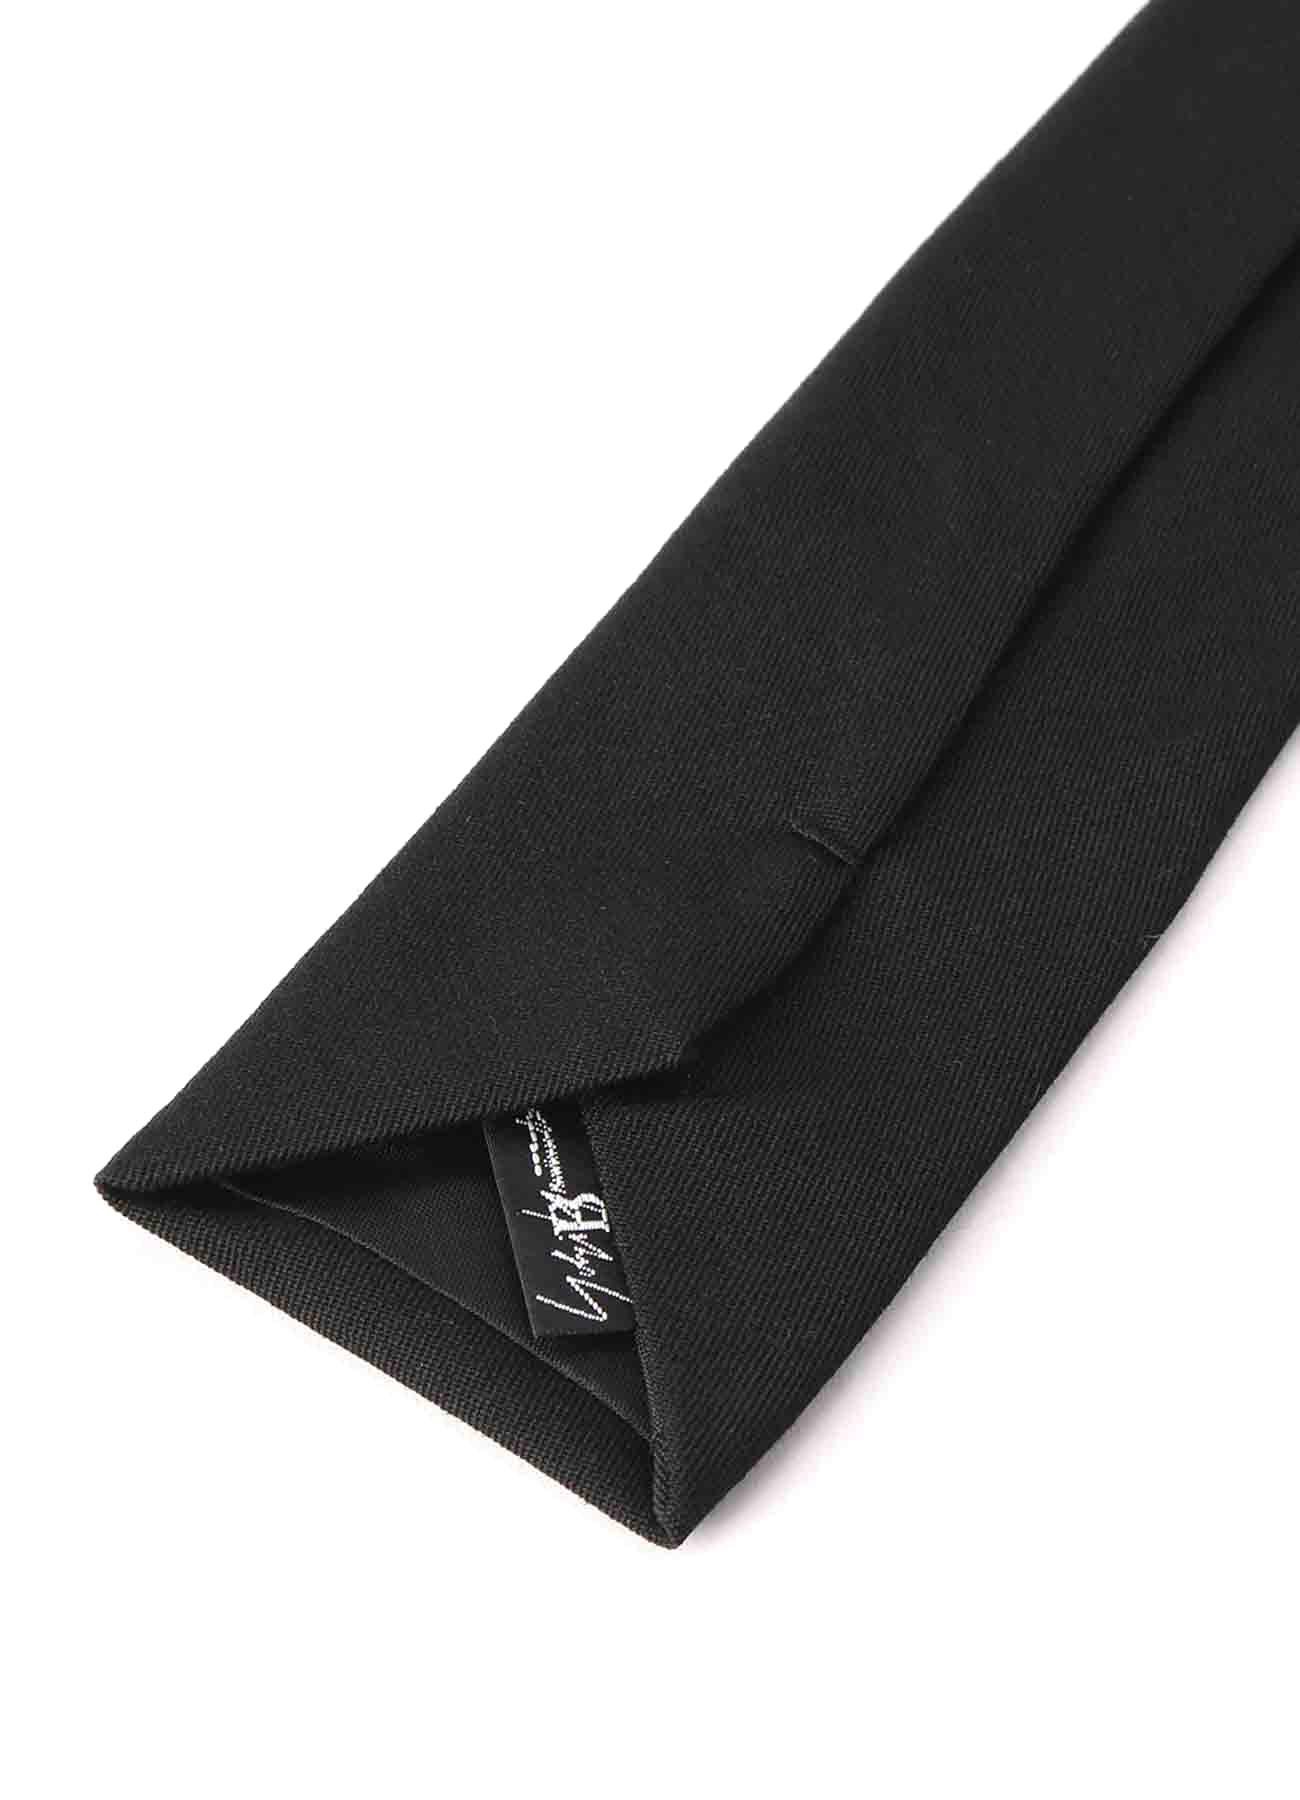 B/ Wool Gabardine Embroidery Tie ''Yohji YAMAMOTO''